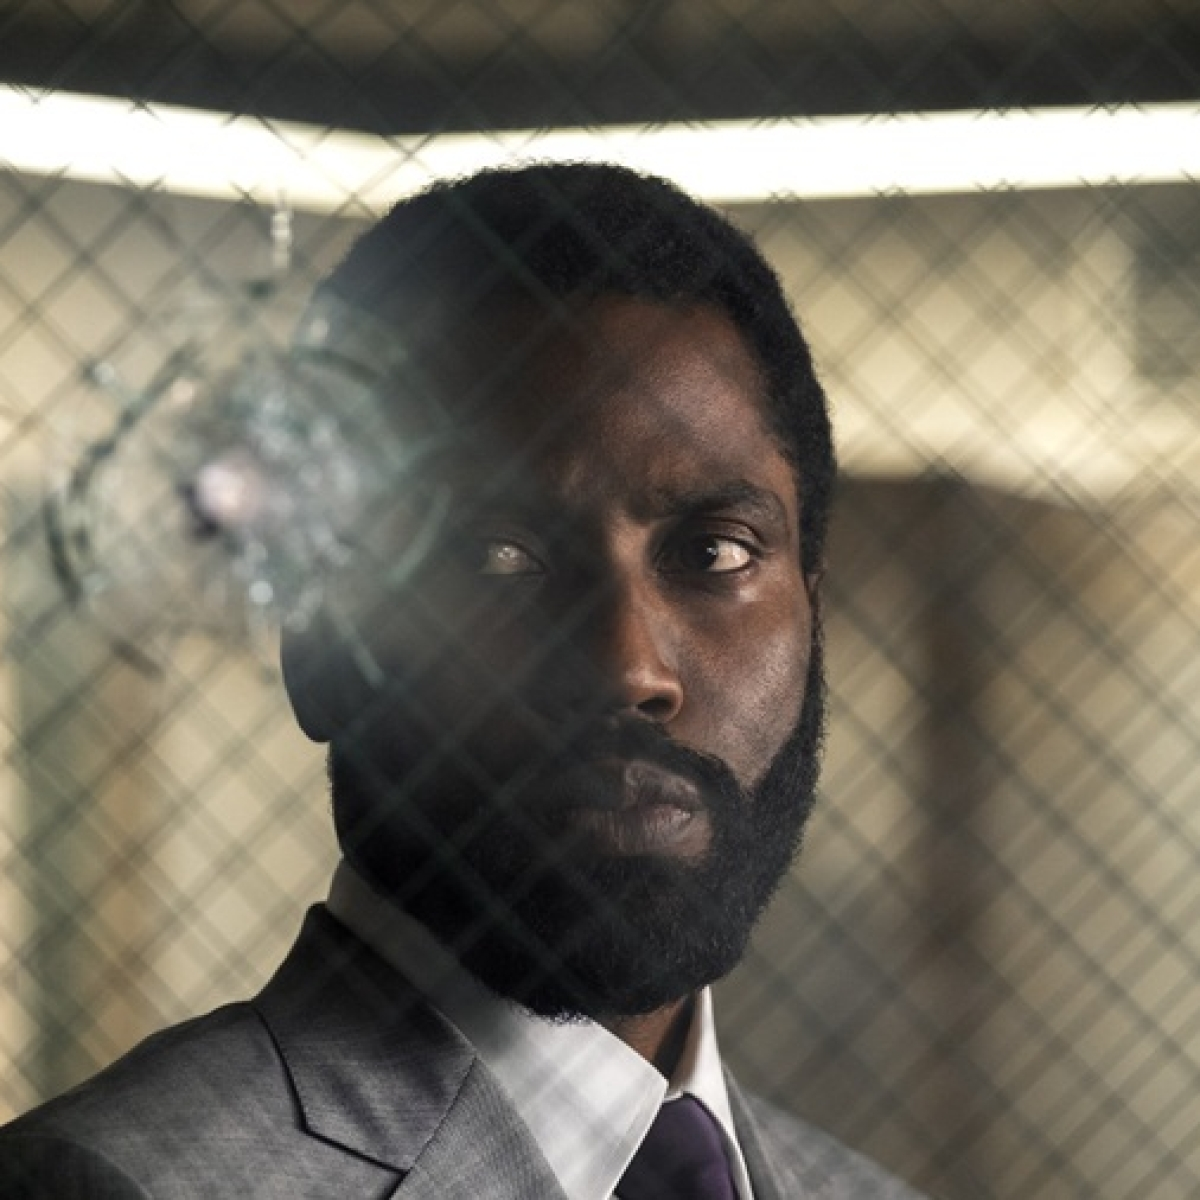 Mumbai takes centre stage in trailer of Christopher Nolan's 'Tenet'